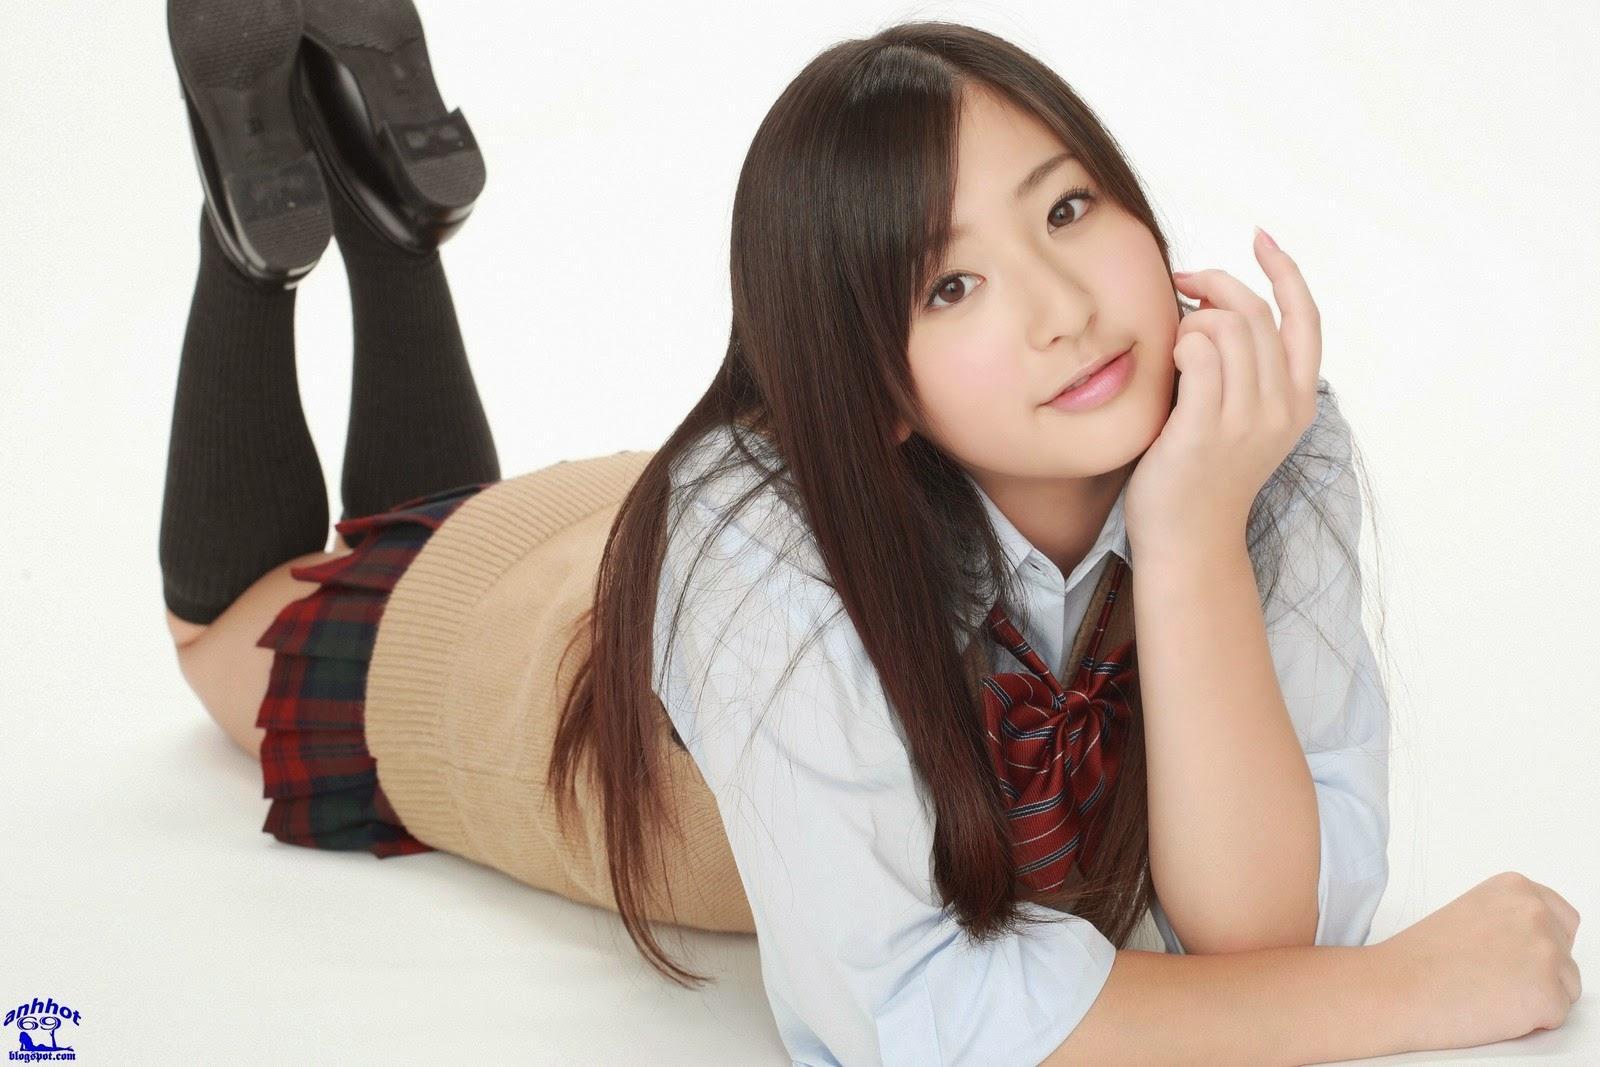 yuri-murakami-00562575